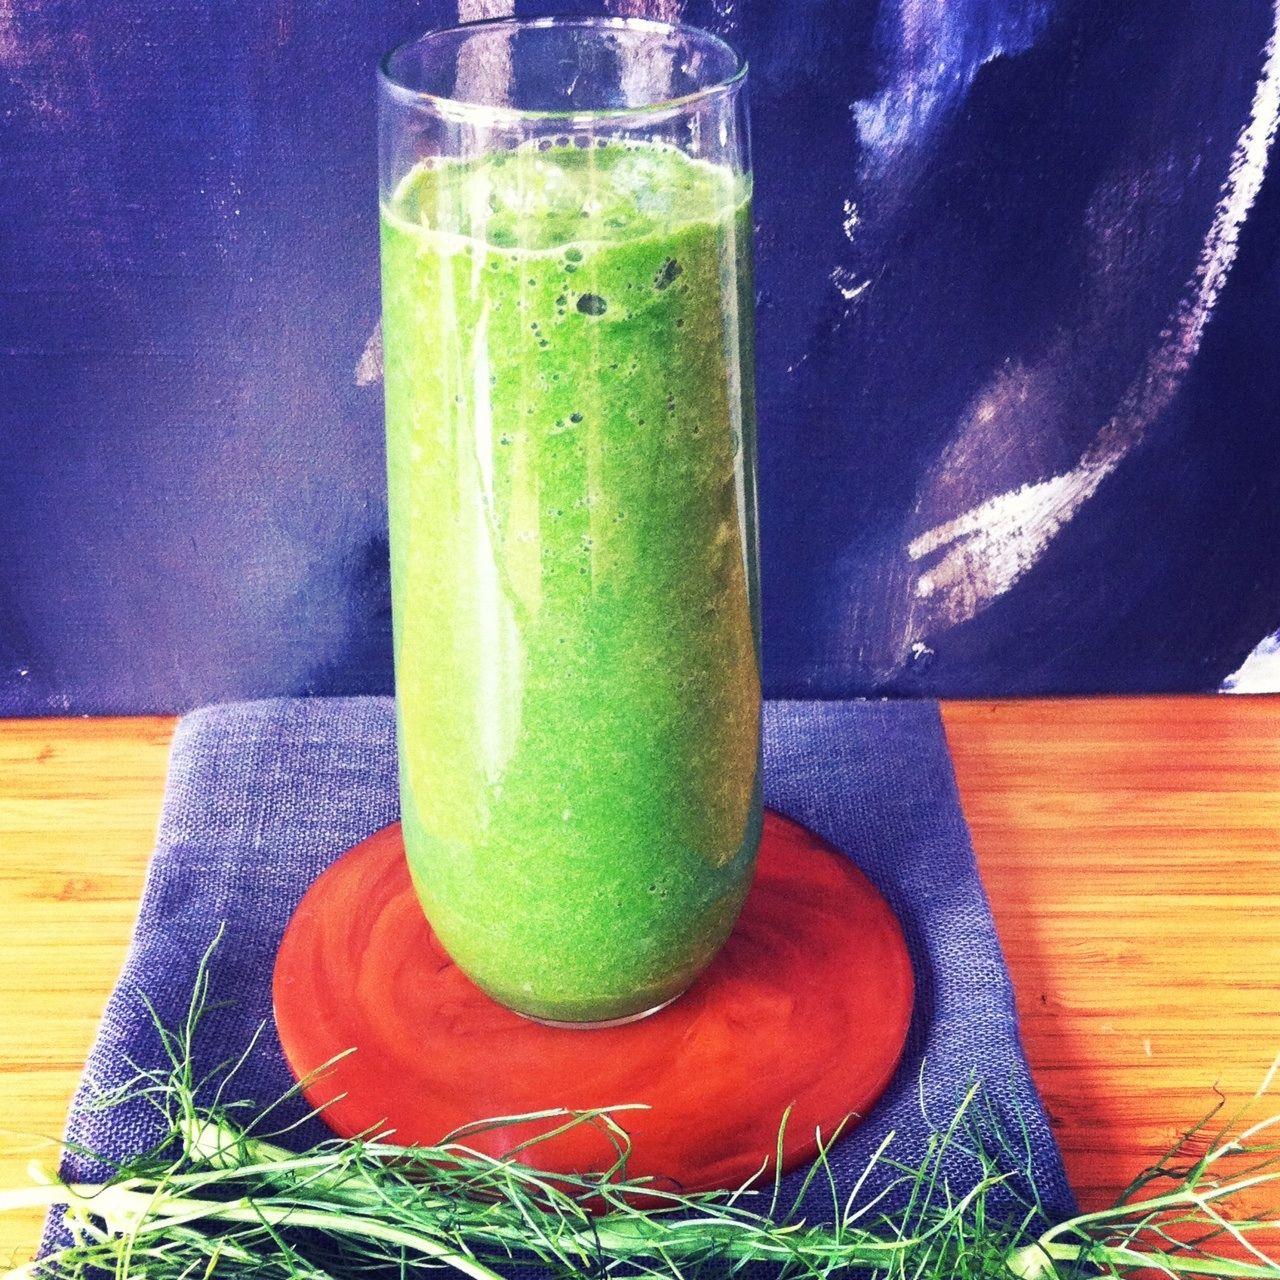 Cucumber fennel lime ingredients 12 organic apple 1